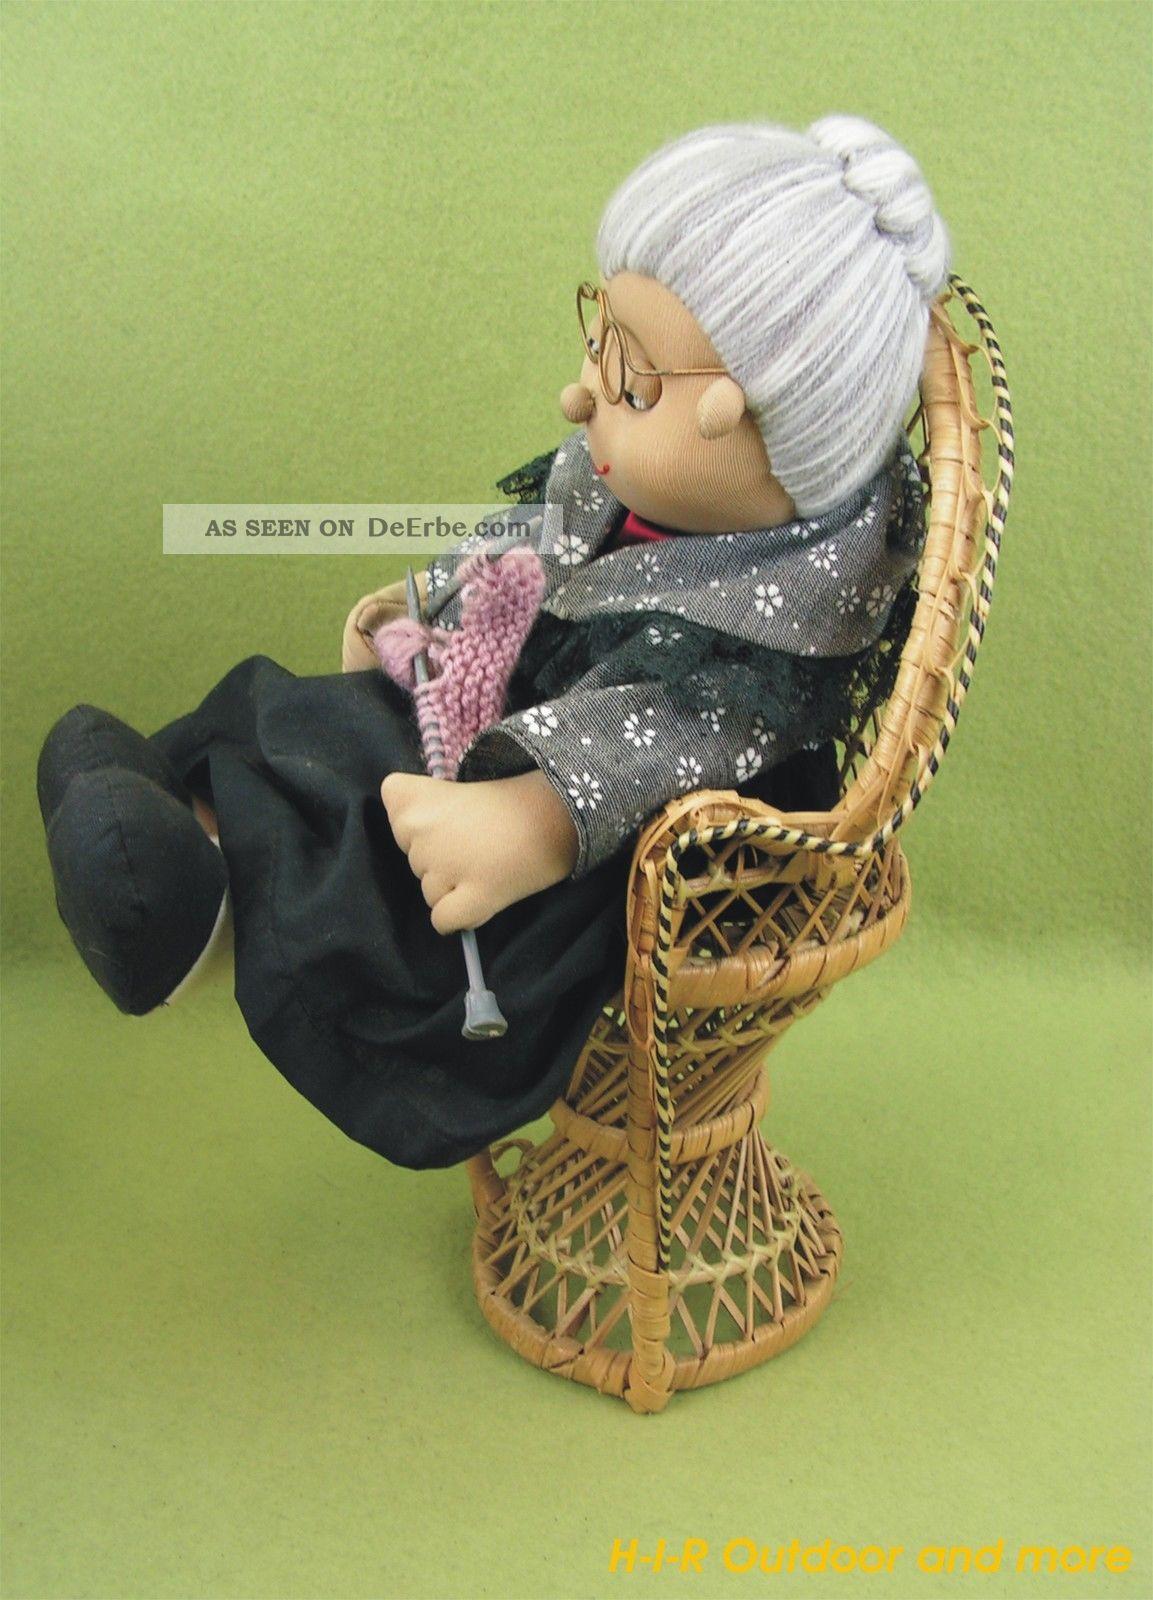 Gro e ltere stoff puppen oma und opa sitzend auf korb for Stuhl 50 cm hoch